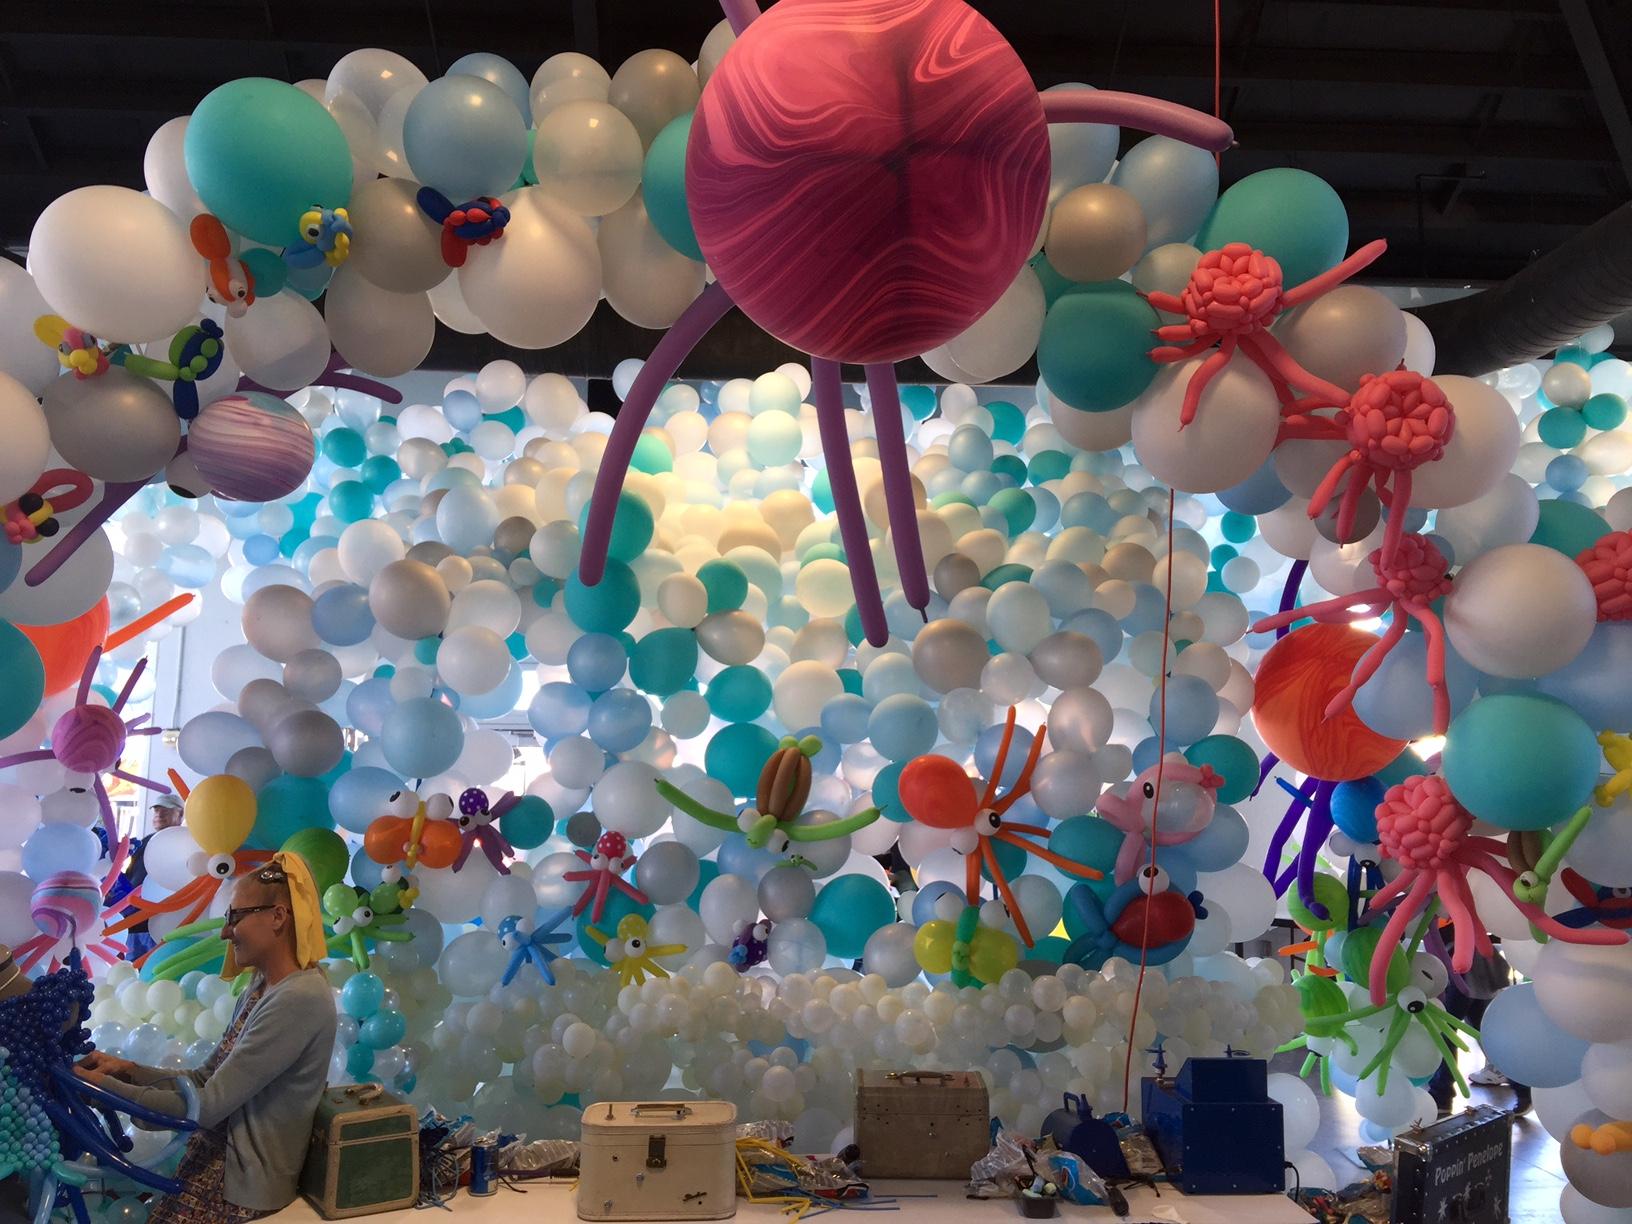 Giant Underwater Balloon Creation